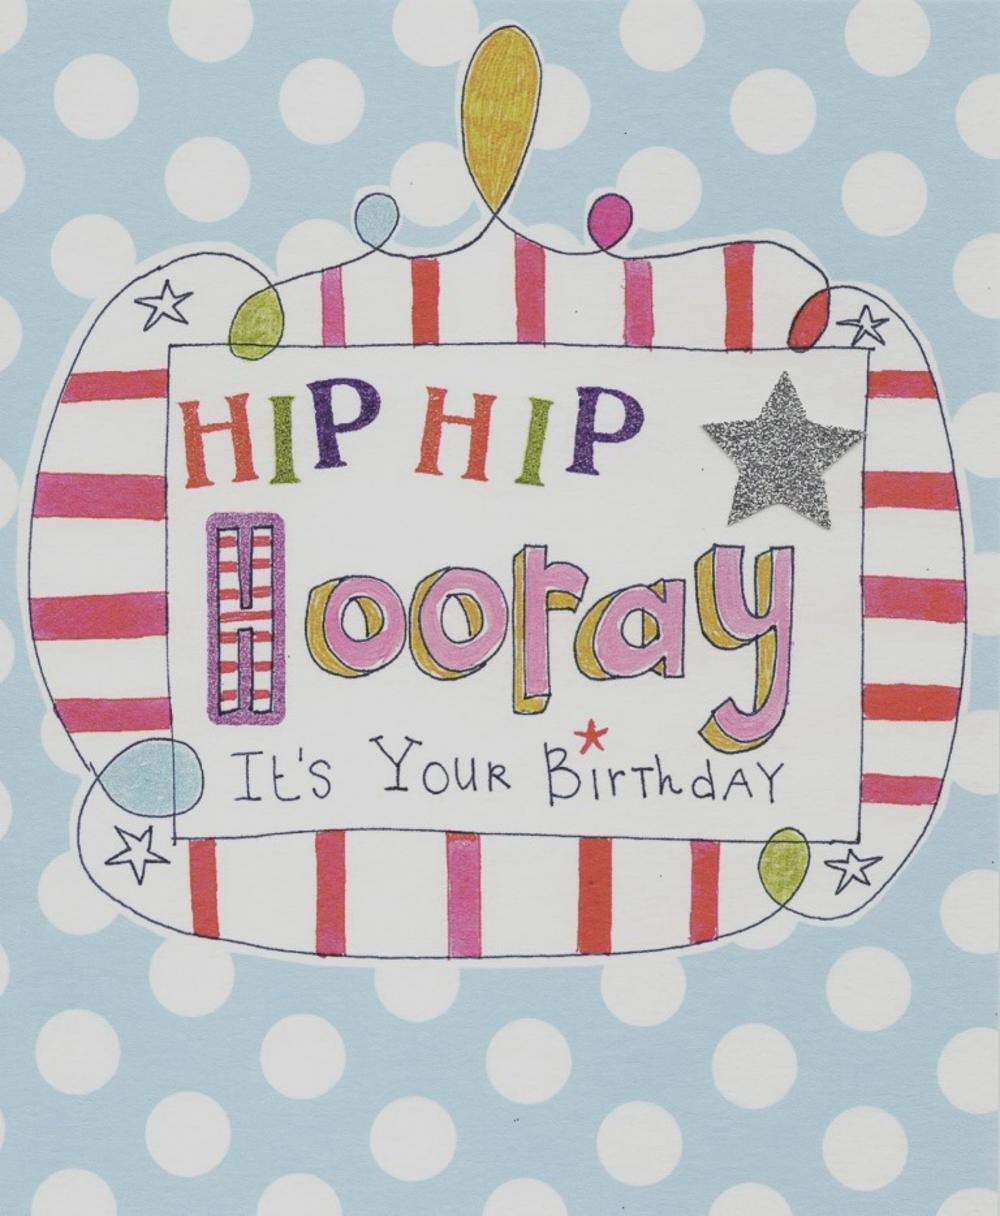 Hip Hip Hooray Paper Salad Birthday Card